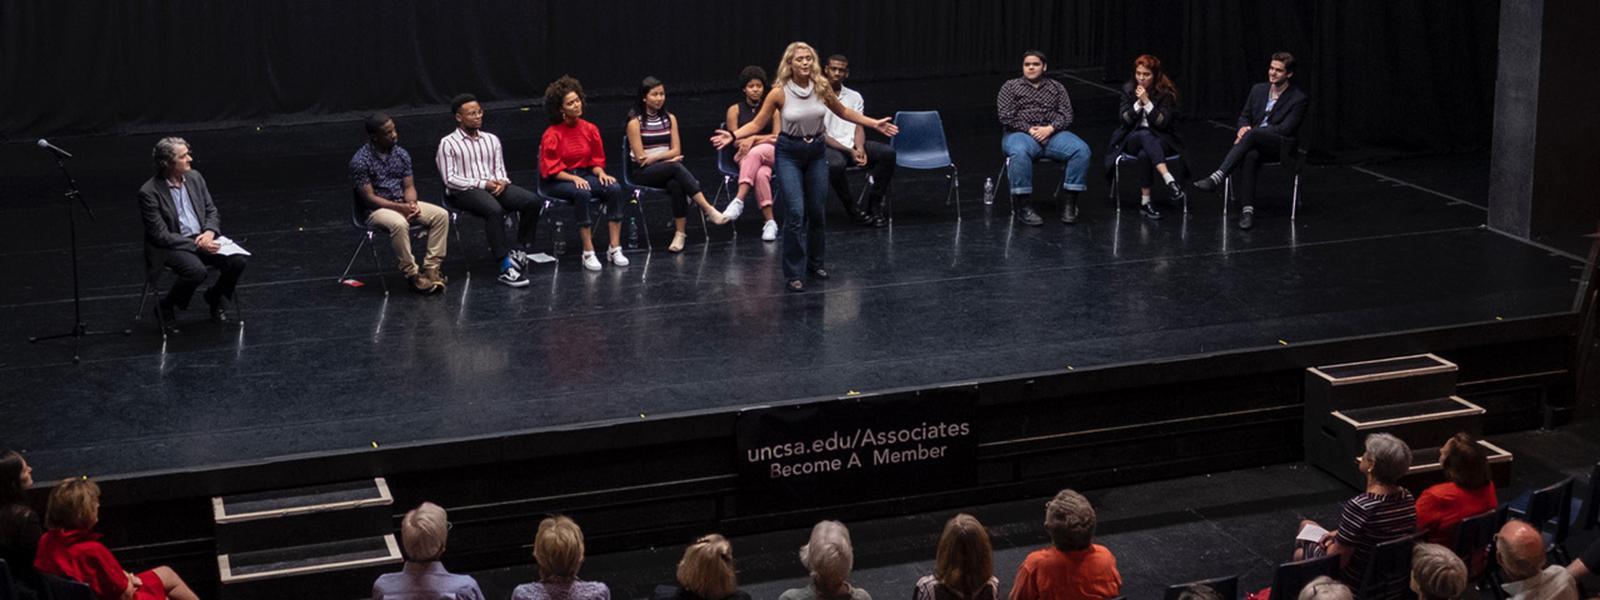 Selected first year Drama students reprise monologues at Associates Fall Kick Off and Membership Drive